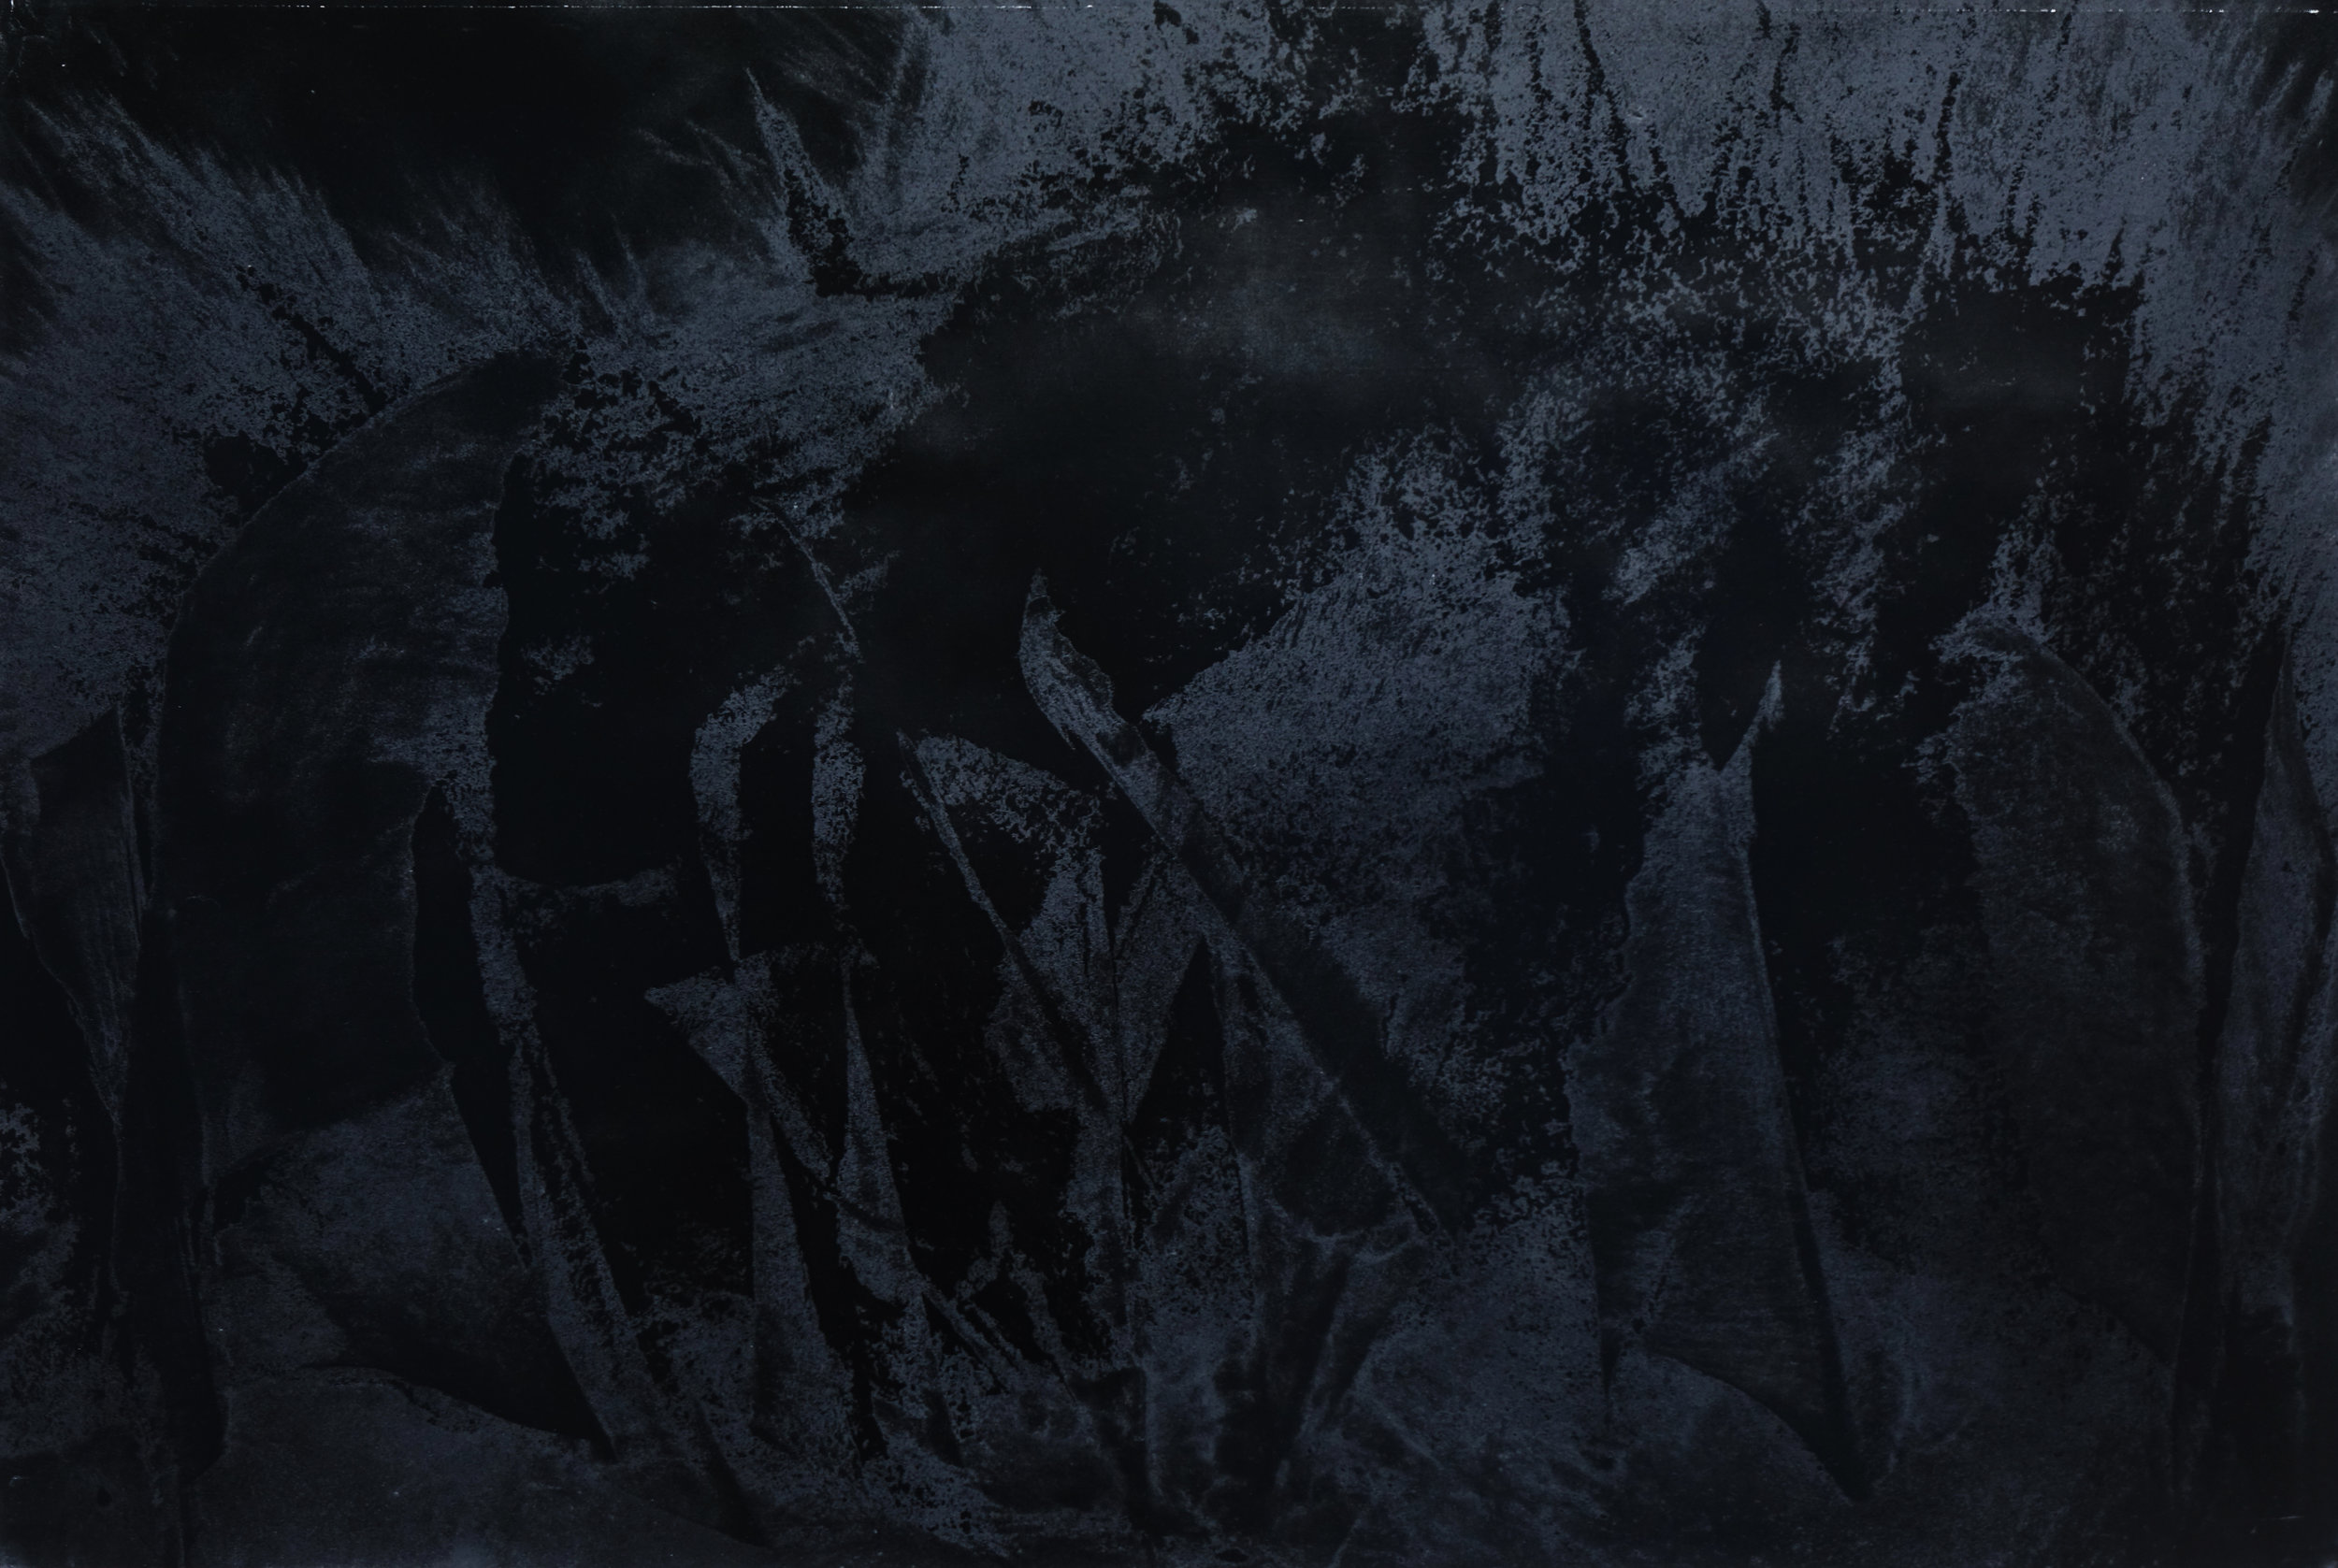 Black Void No. 33, 2016, 194cm x 130cm 120F, Oil on Canvas.jpg